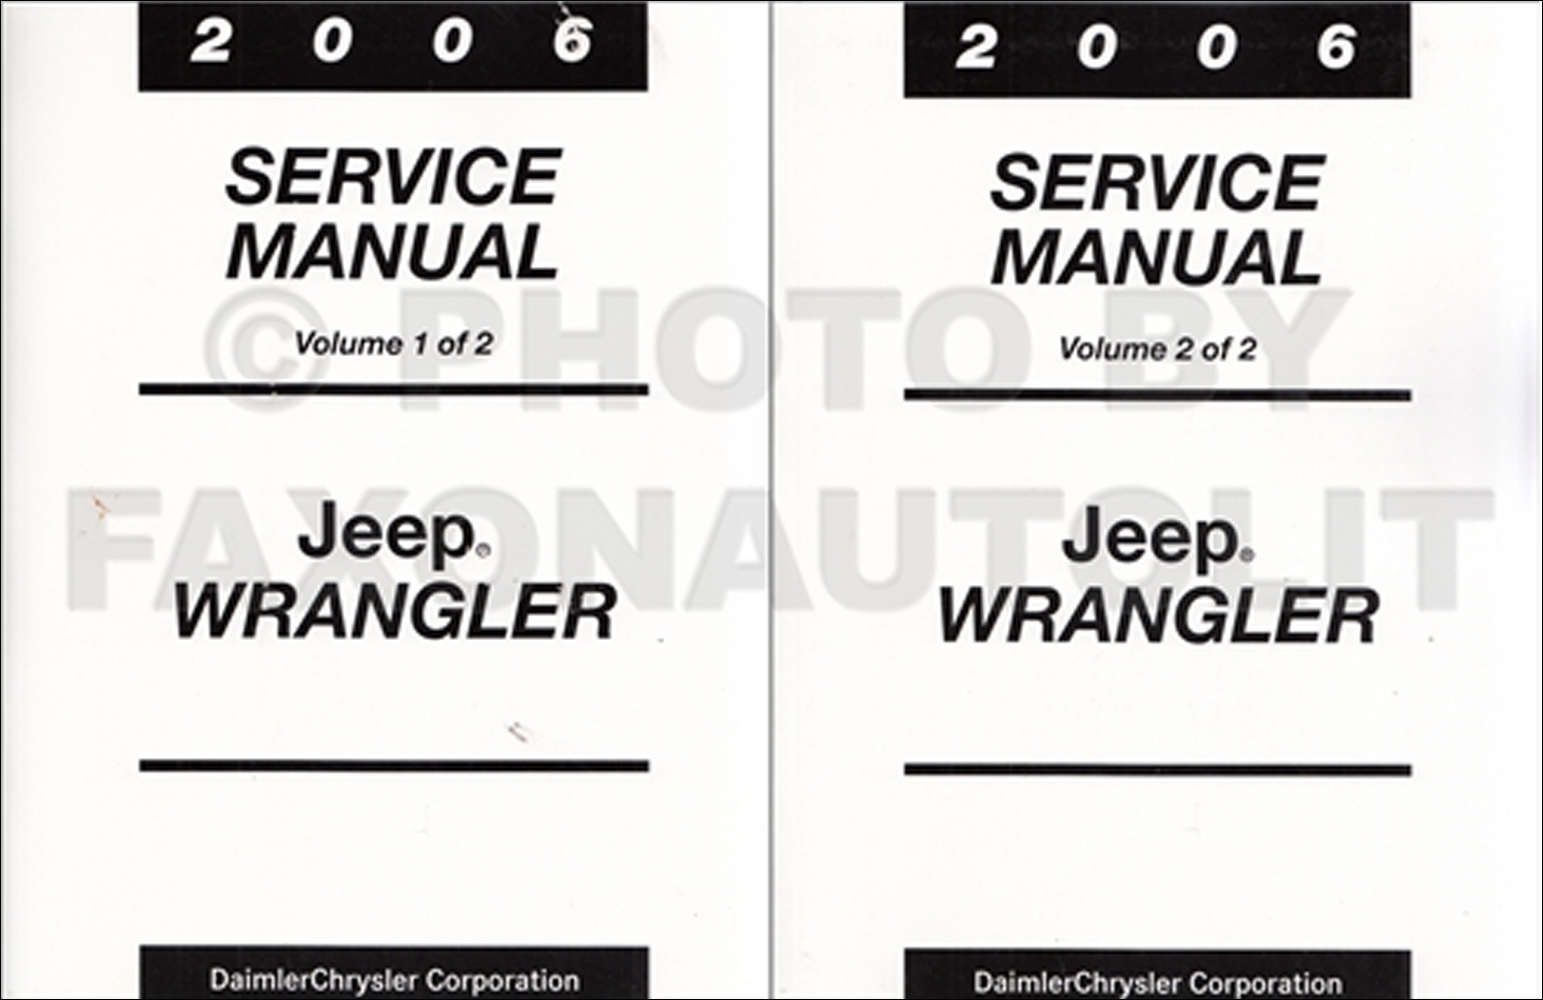 service manual work repair manual 2006 jeep wrangler. Black Bedroom Furniture Sets. Home Design Ideas